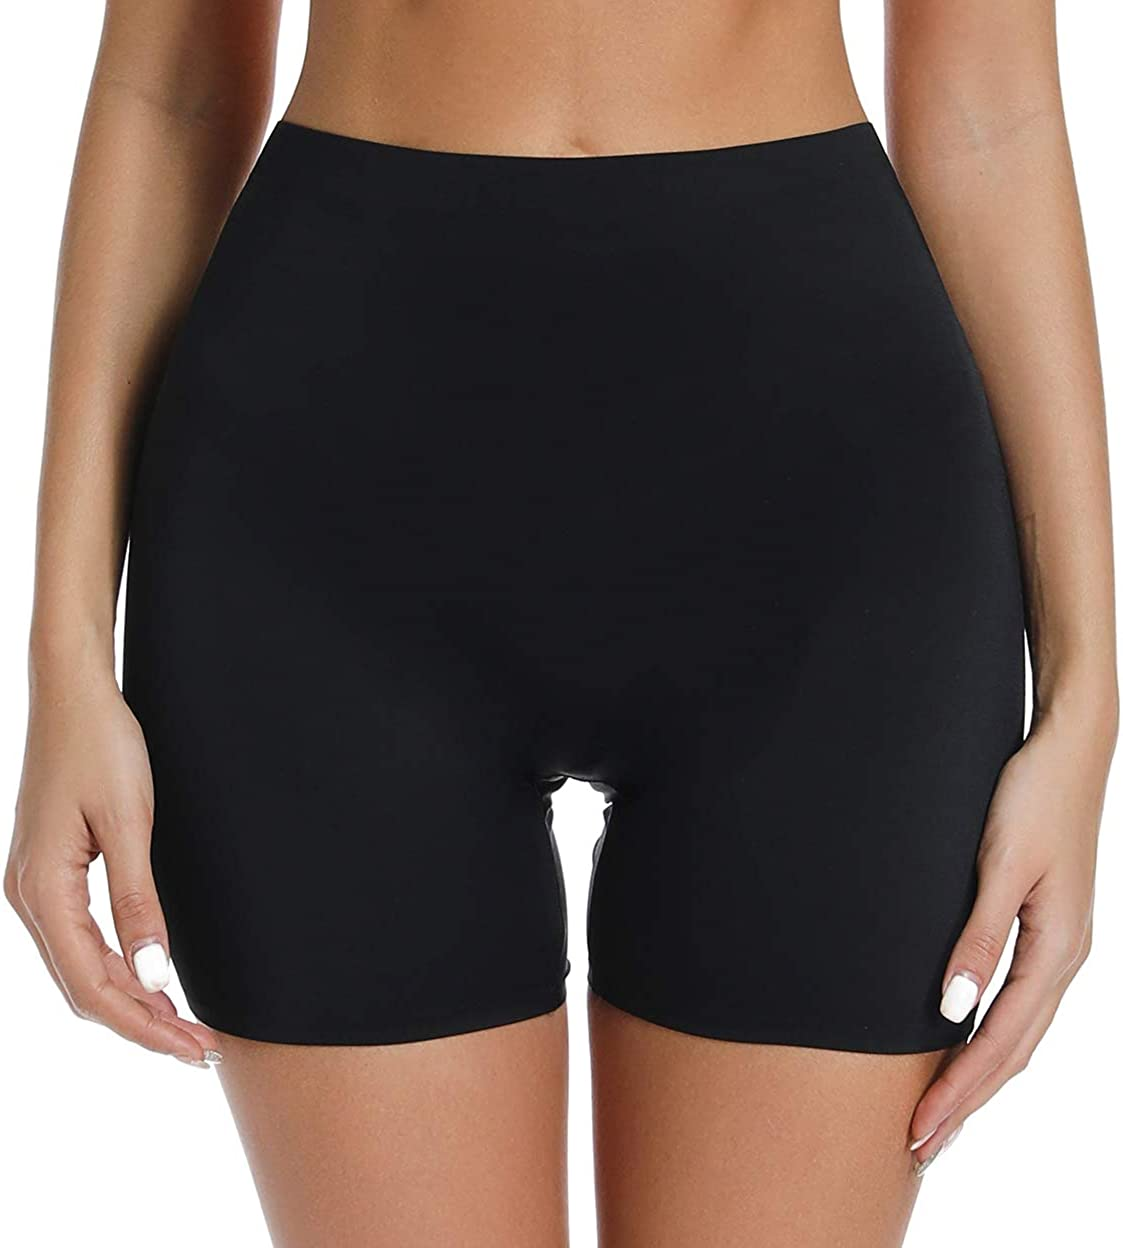 WOWENY Slip Shorts for Women Under Dresses Skirts Mid High Waist Seamless Smooth Panties Boyshorts